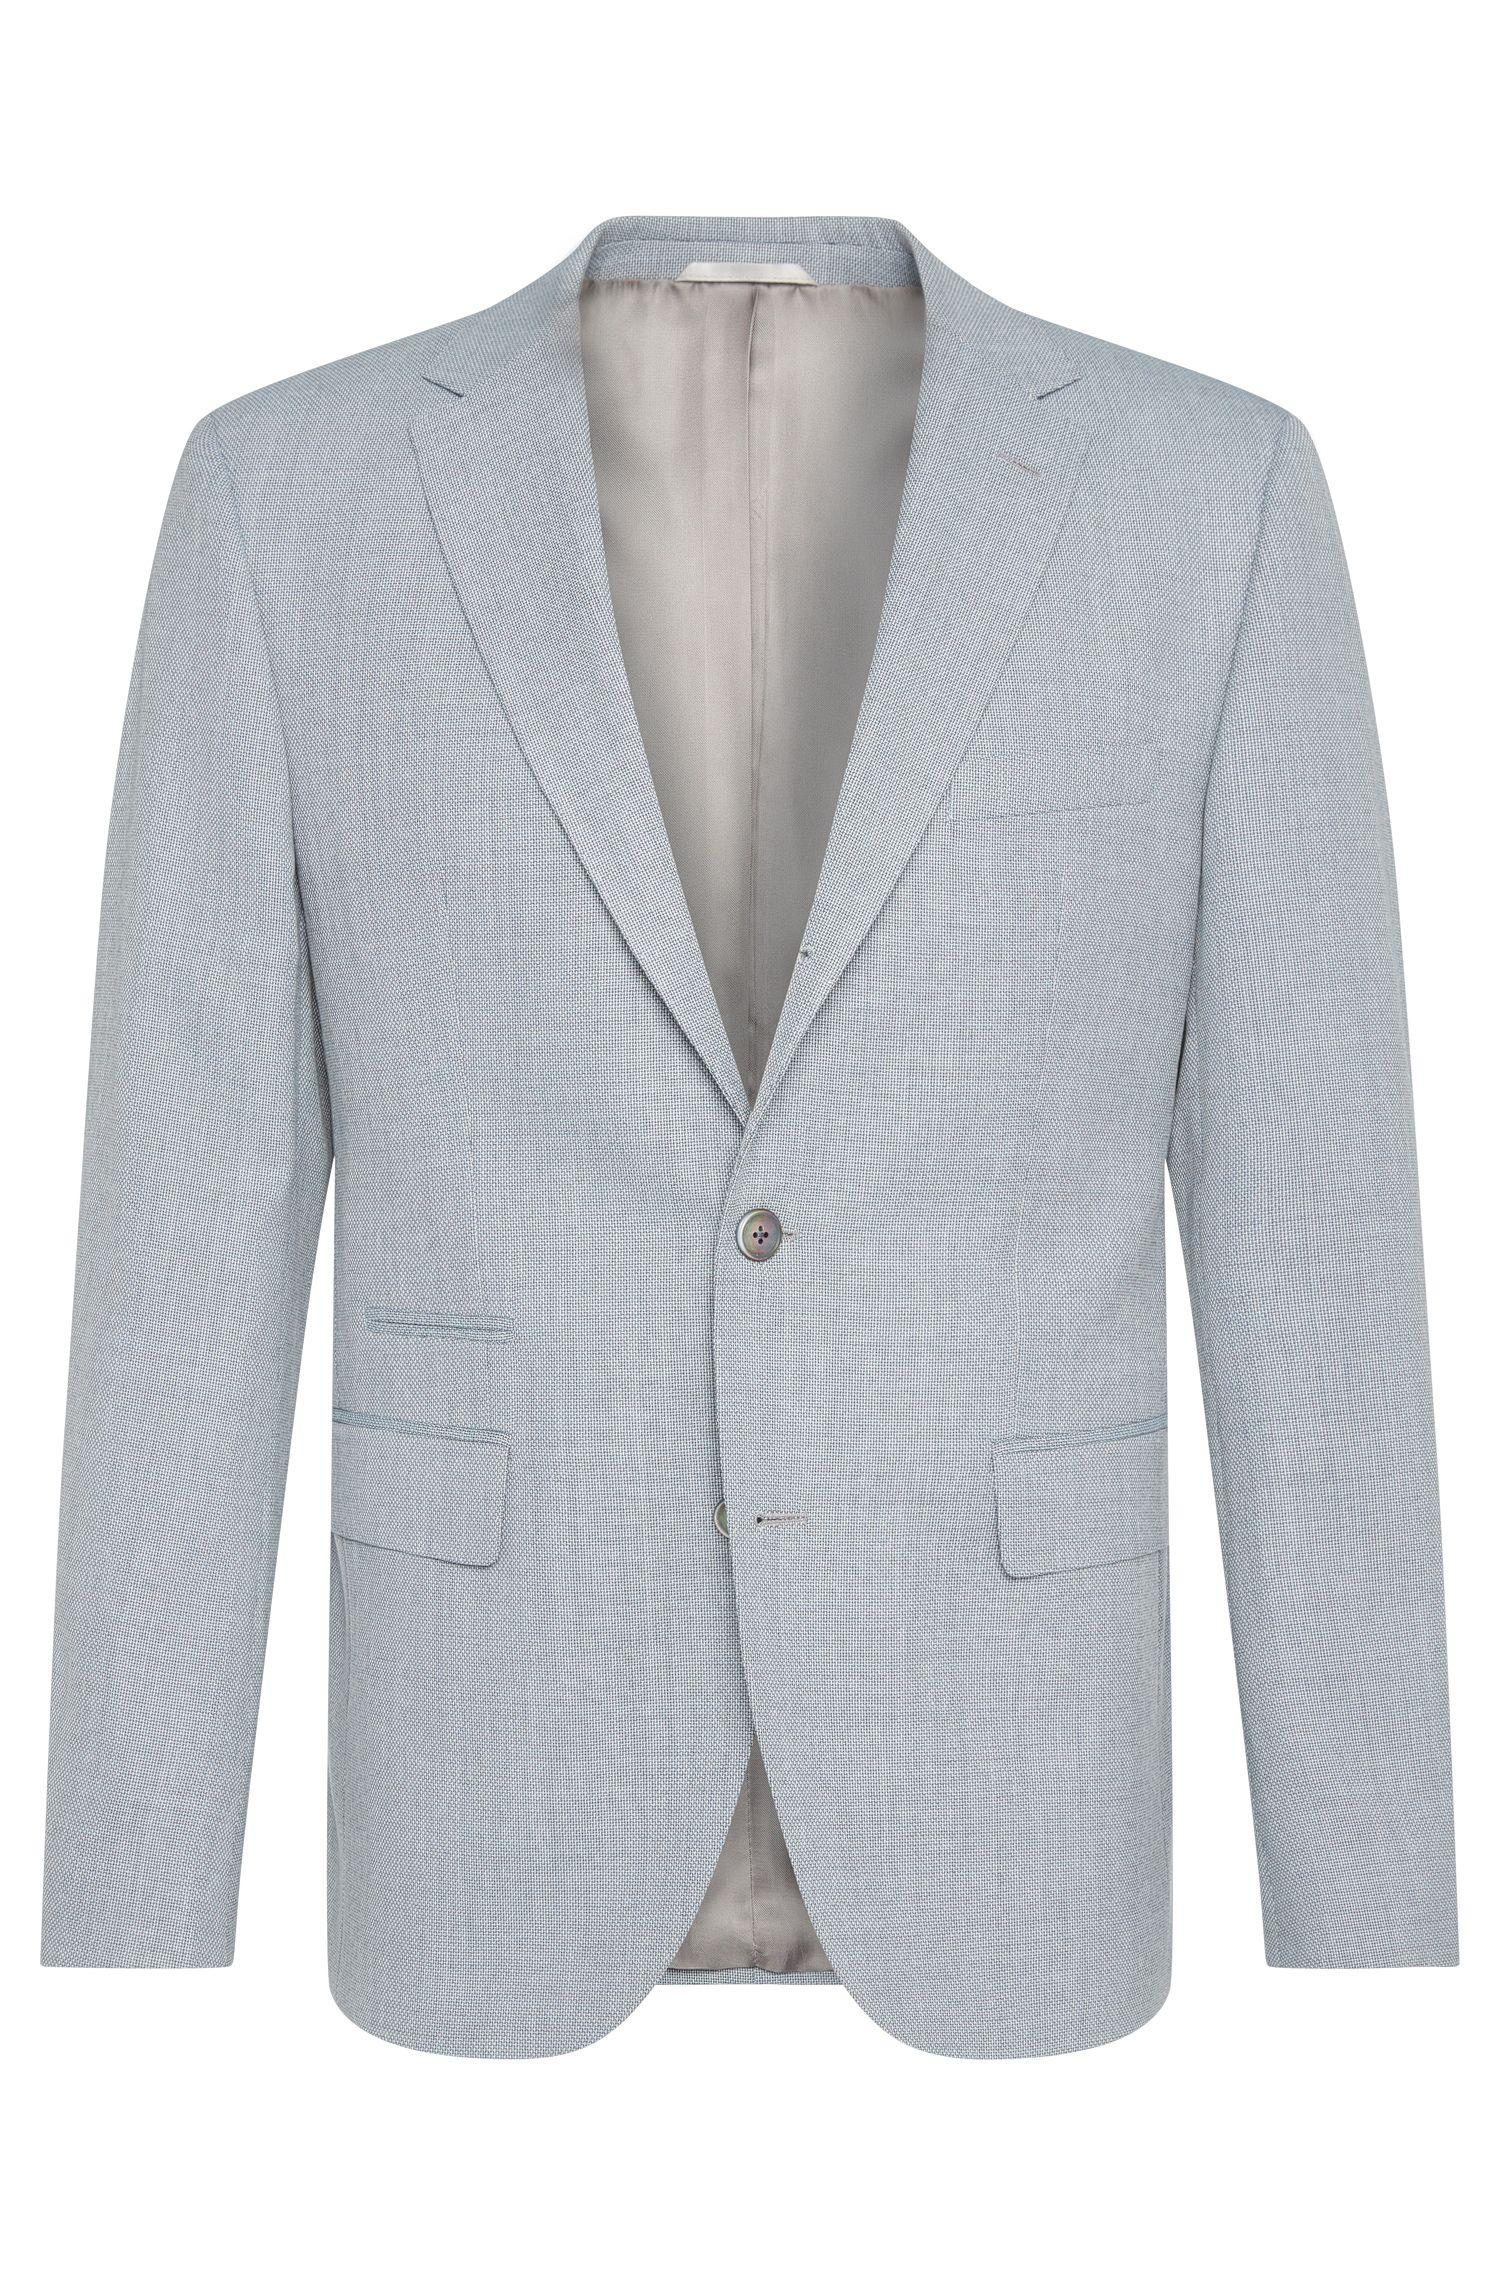 'Johnston' | Regular Fit, Italian Virgin Wool Sport Coat